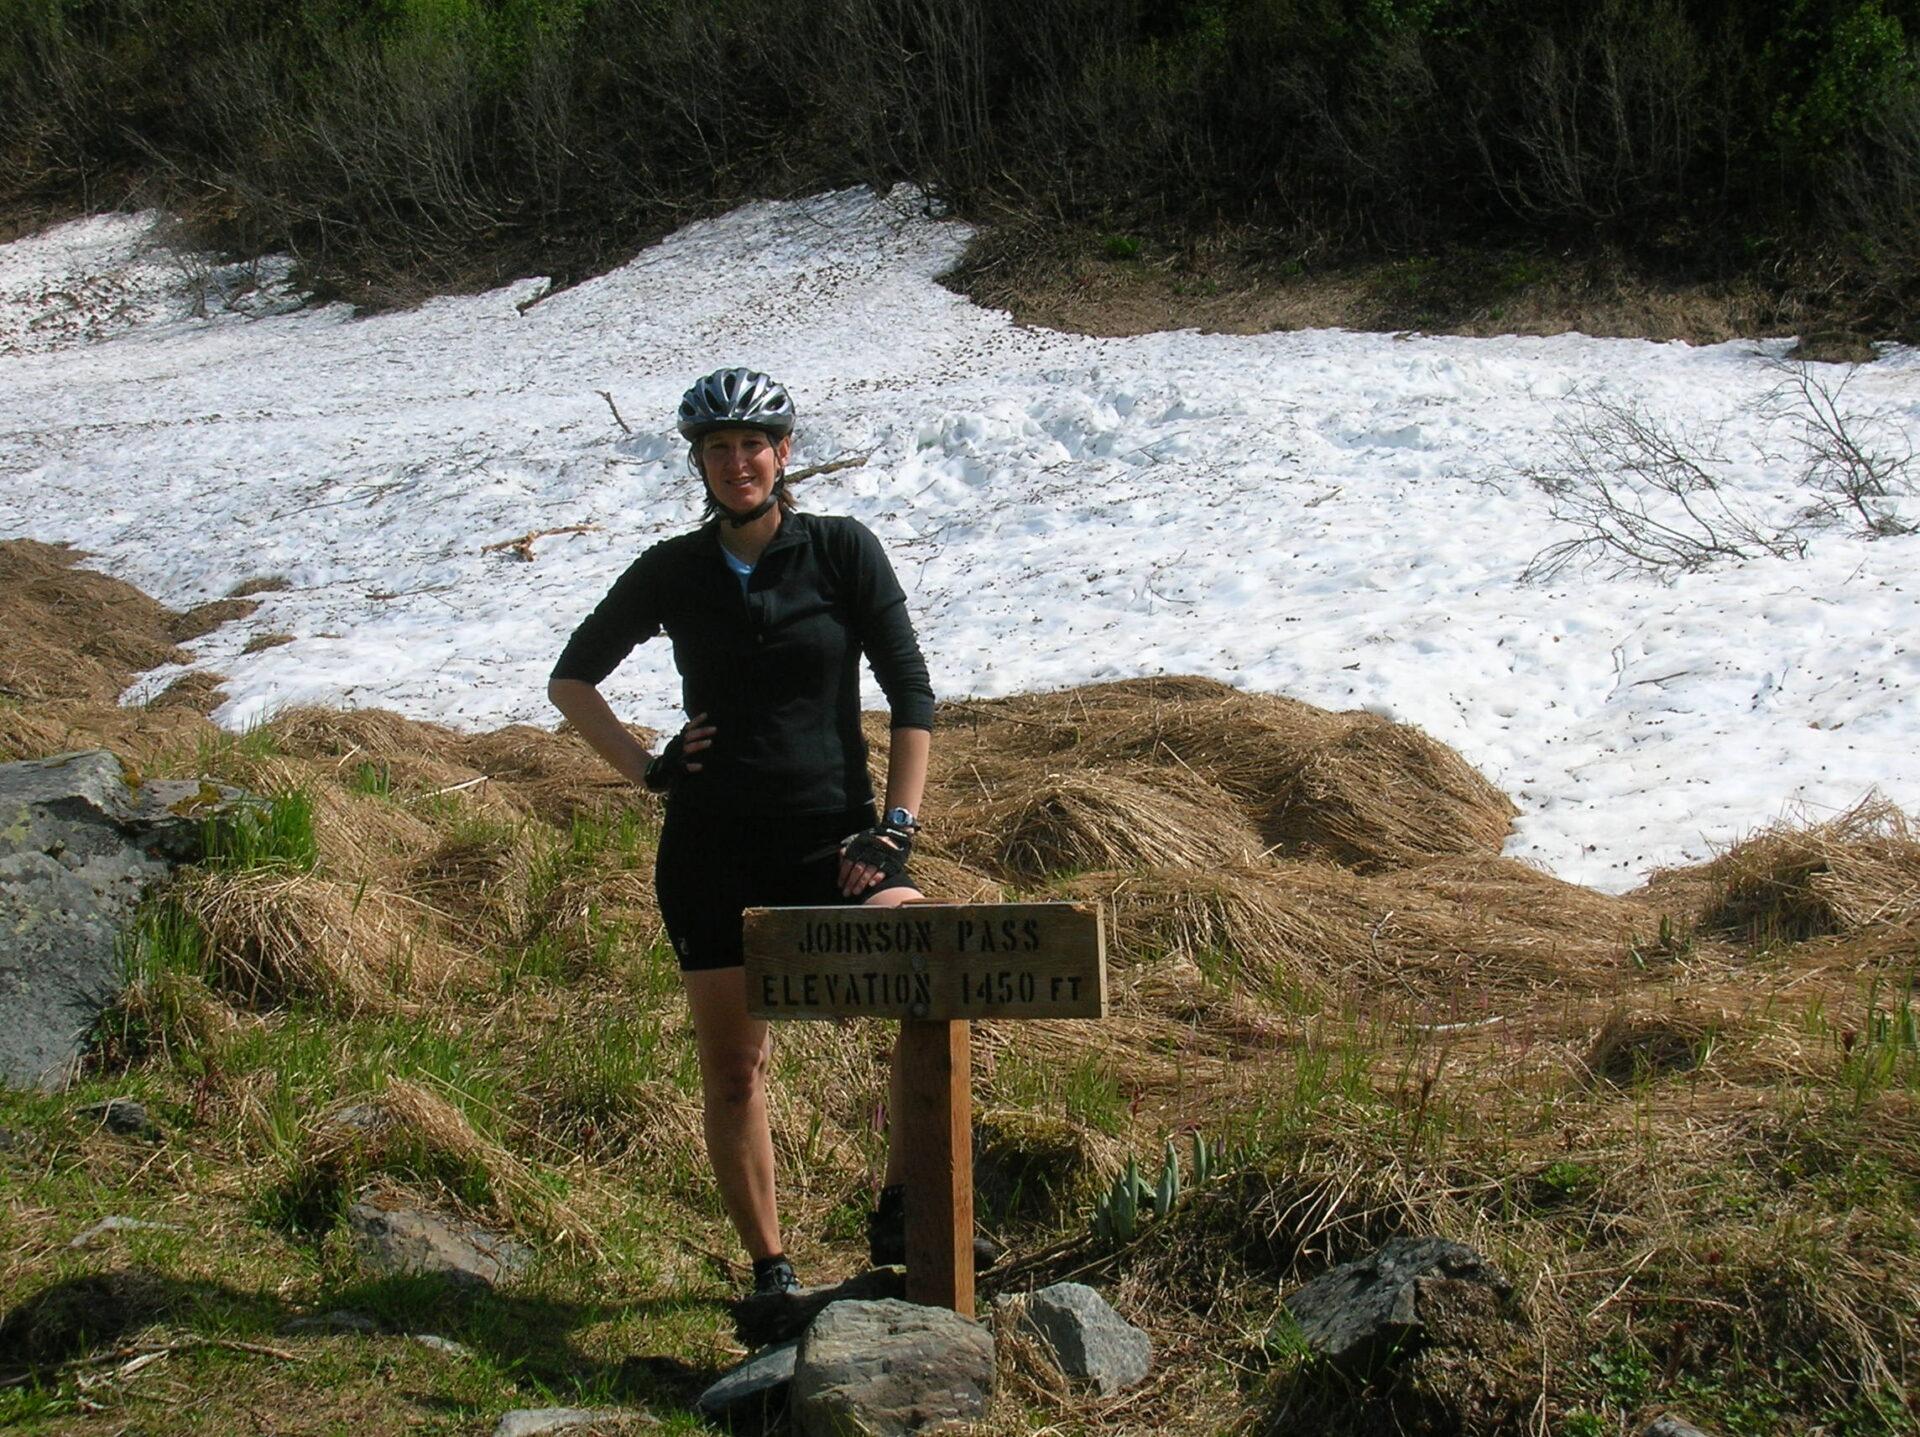 Johnson Pass Trail